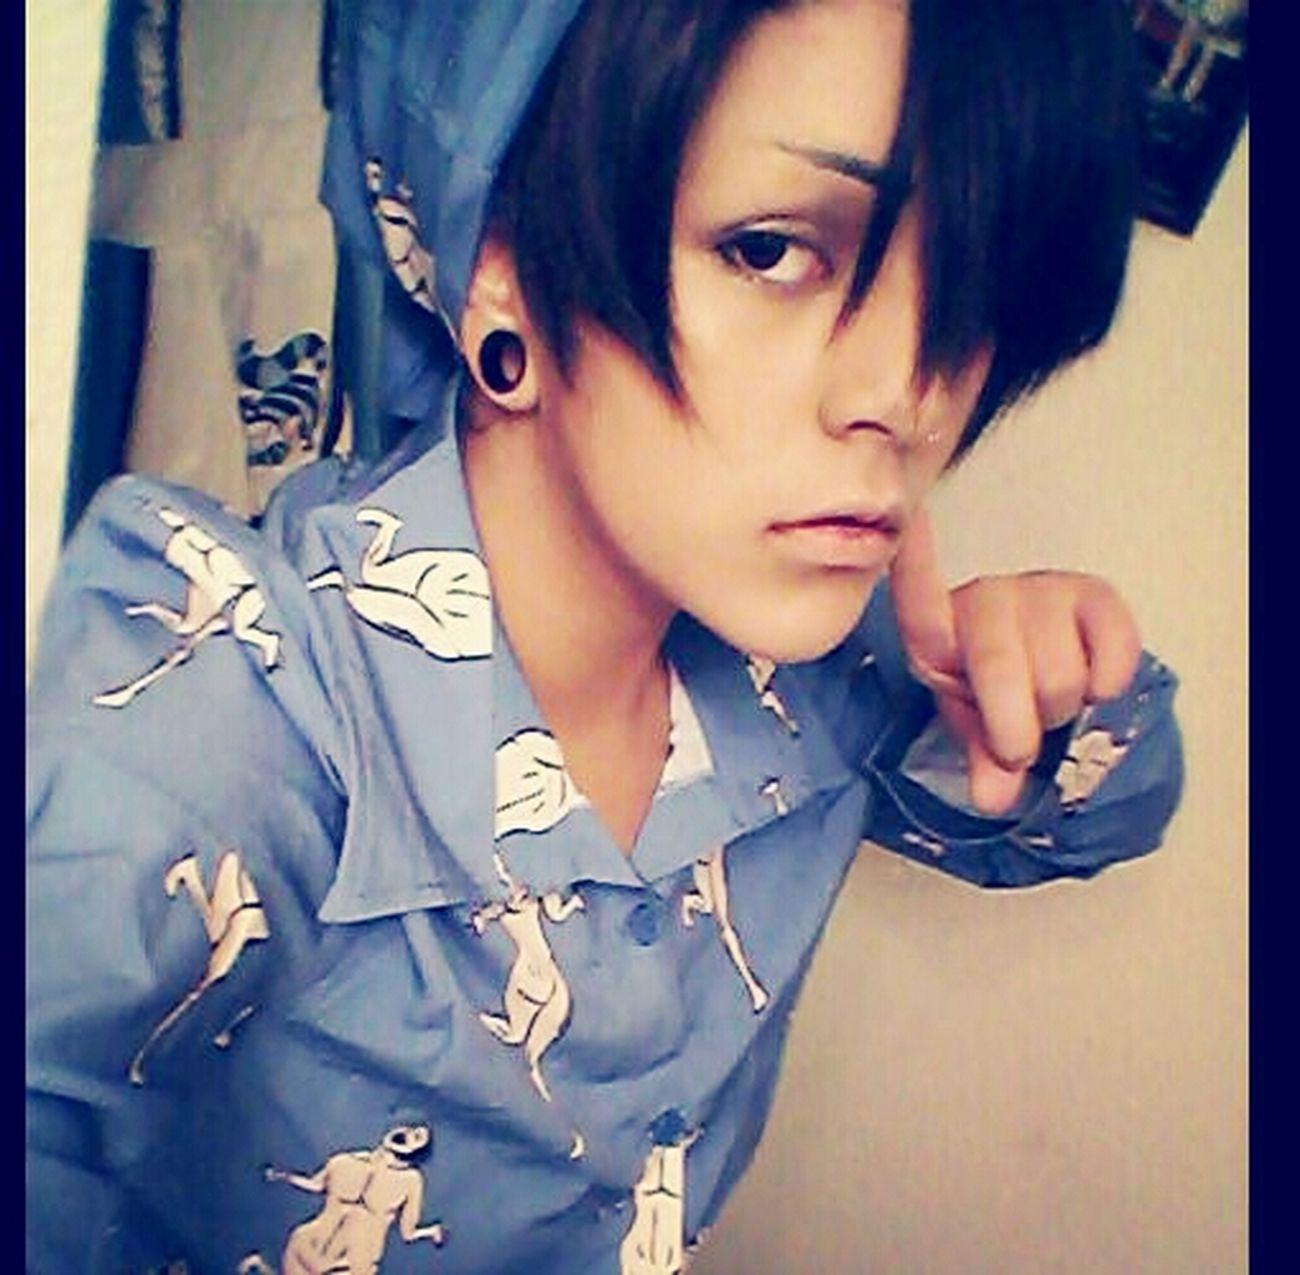 My Levi cosplay Cosplay Attackontitan Aot Snk